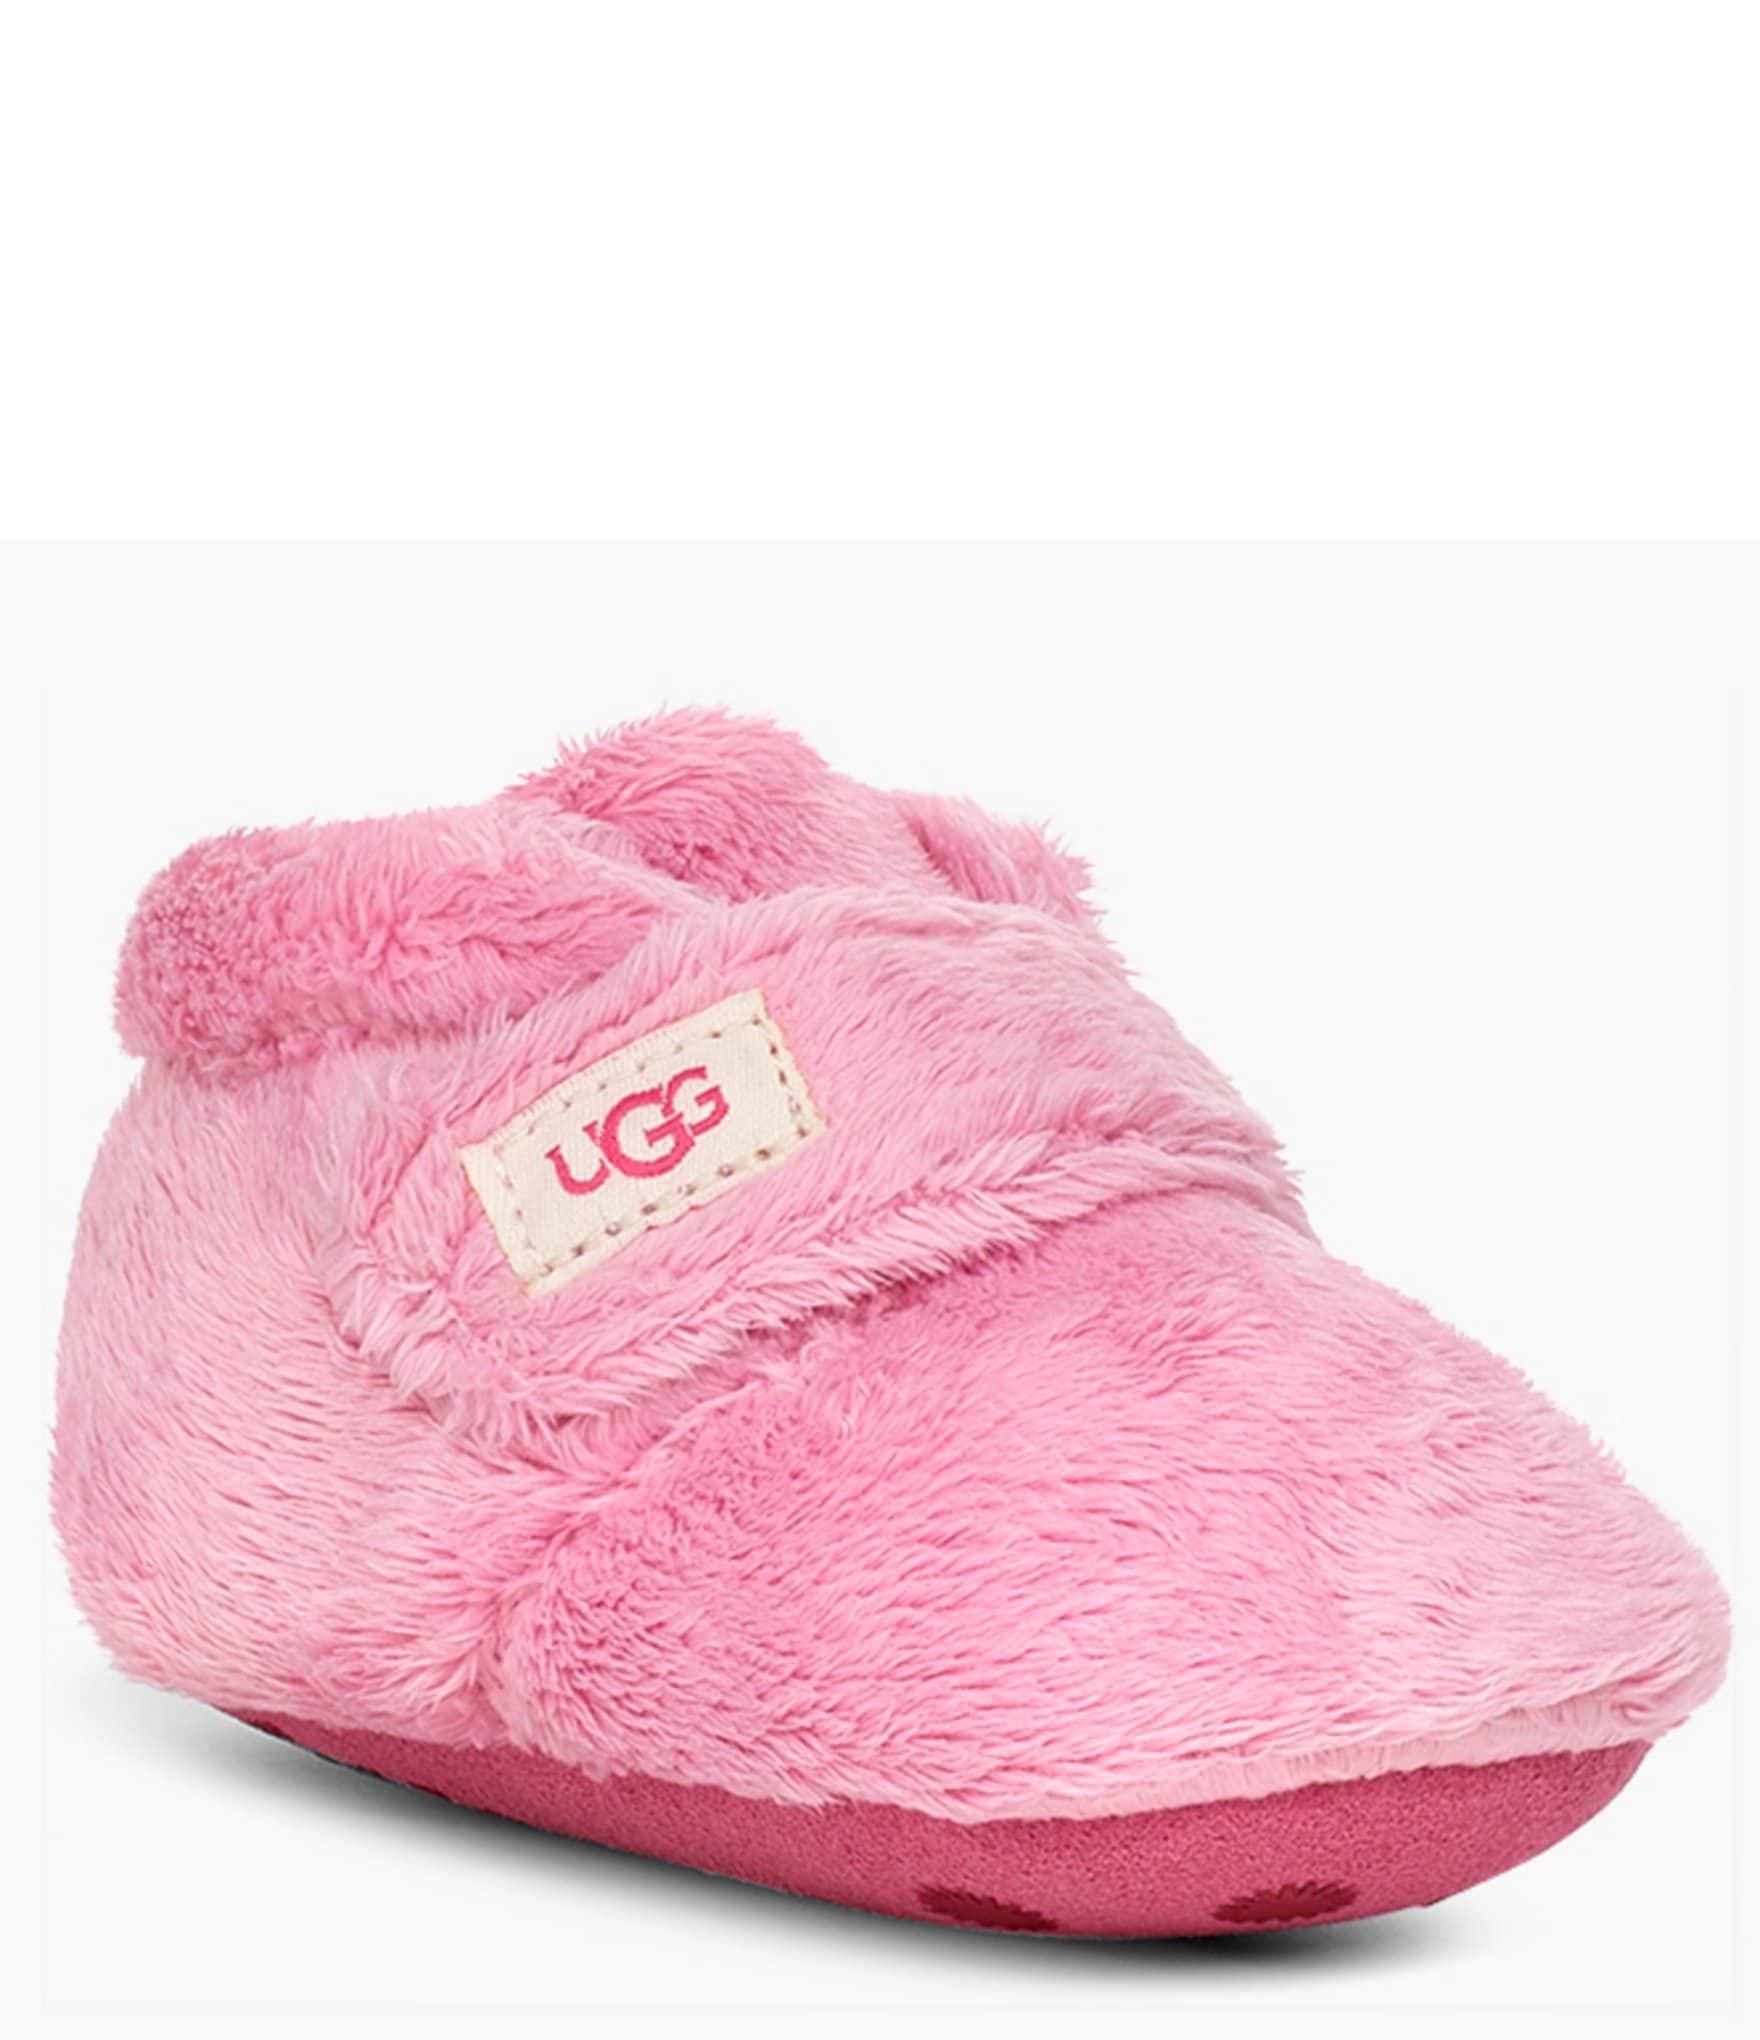 114d69e7cb8 UGG Girls' Bixbee Crib Shoe